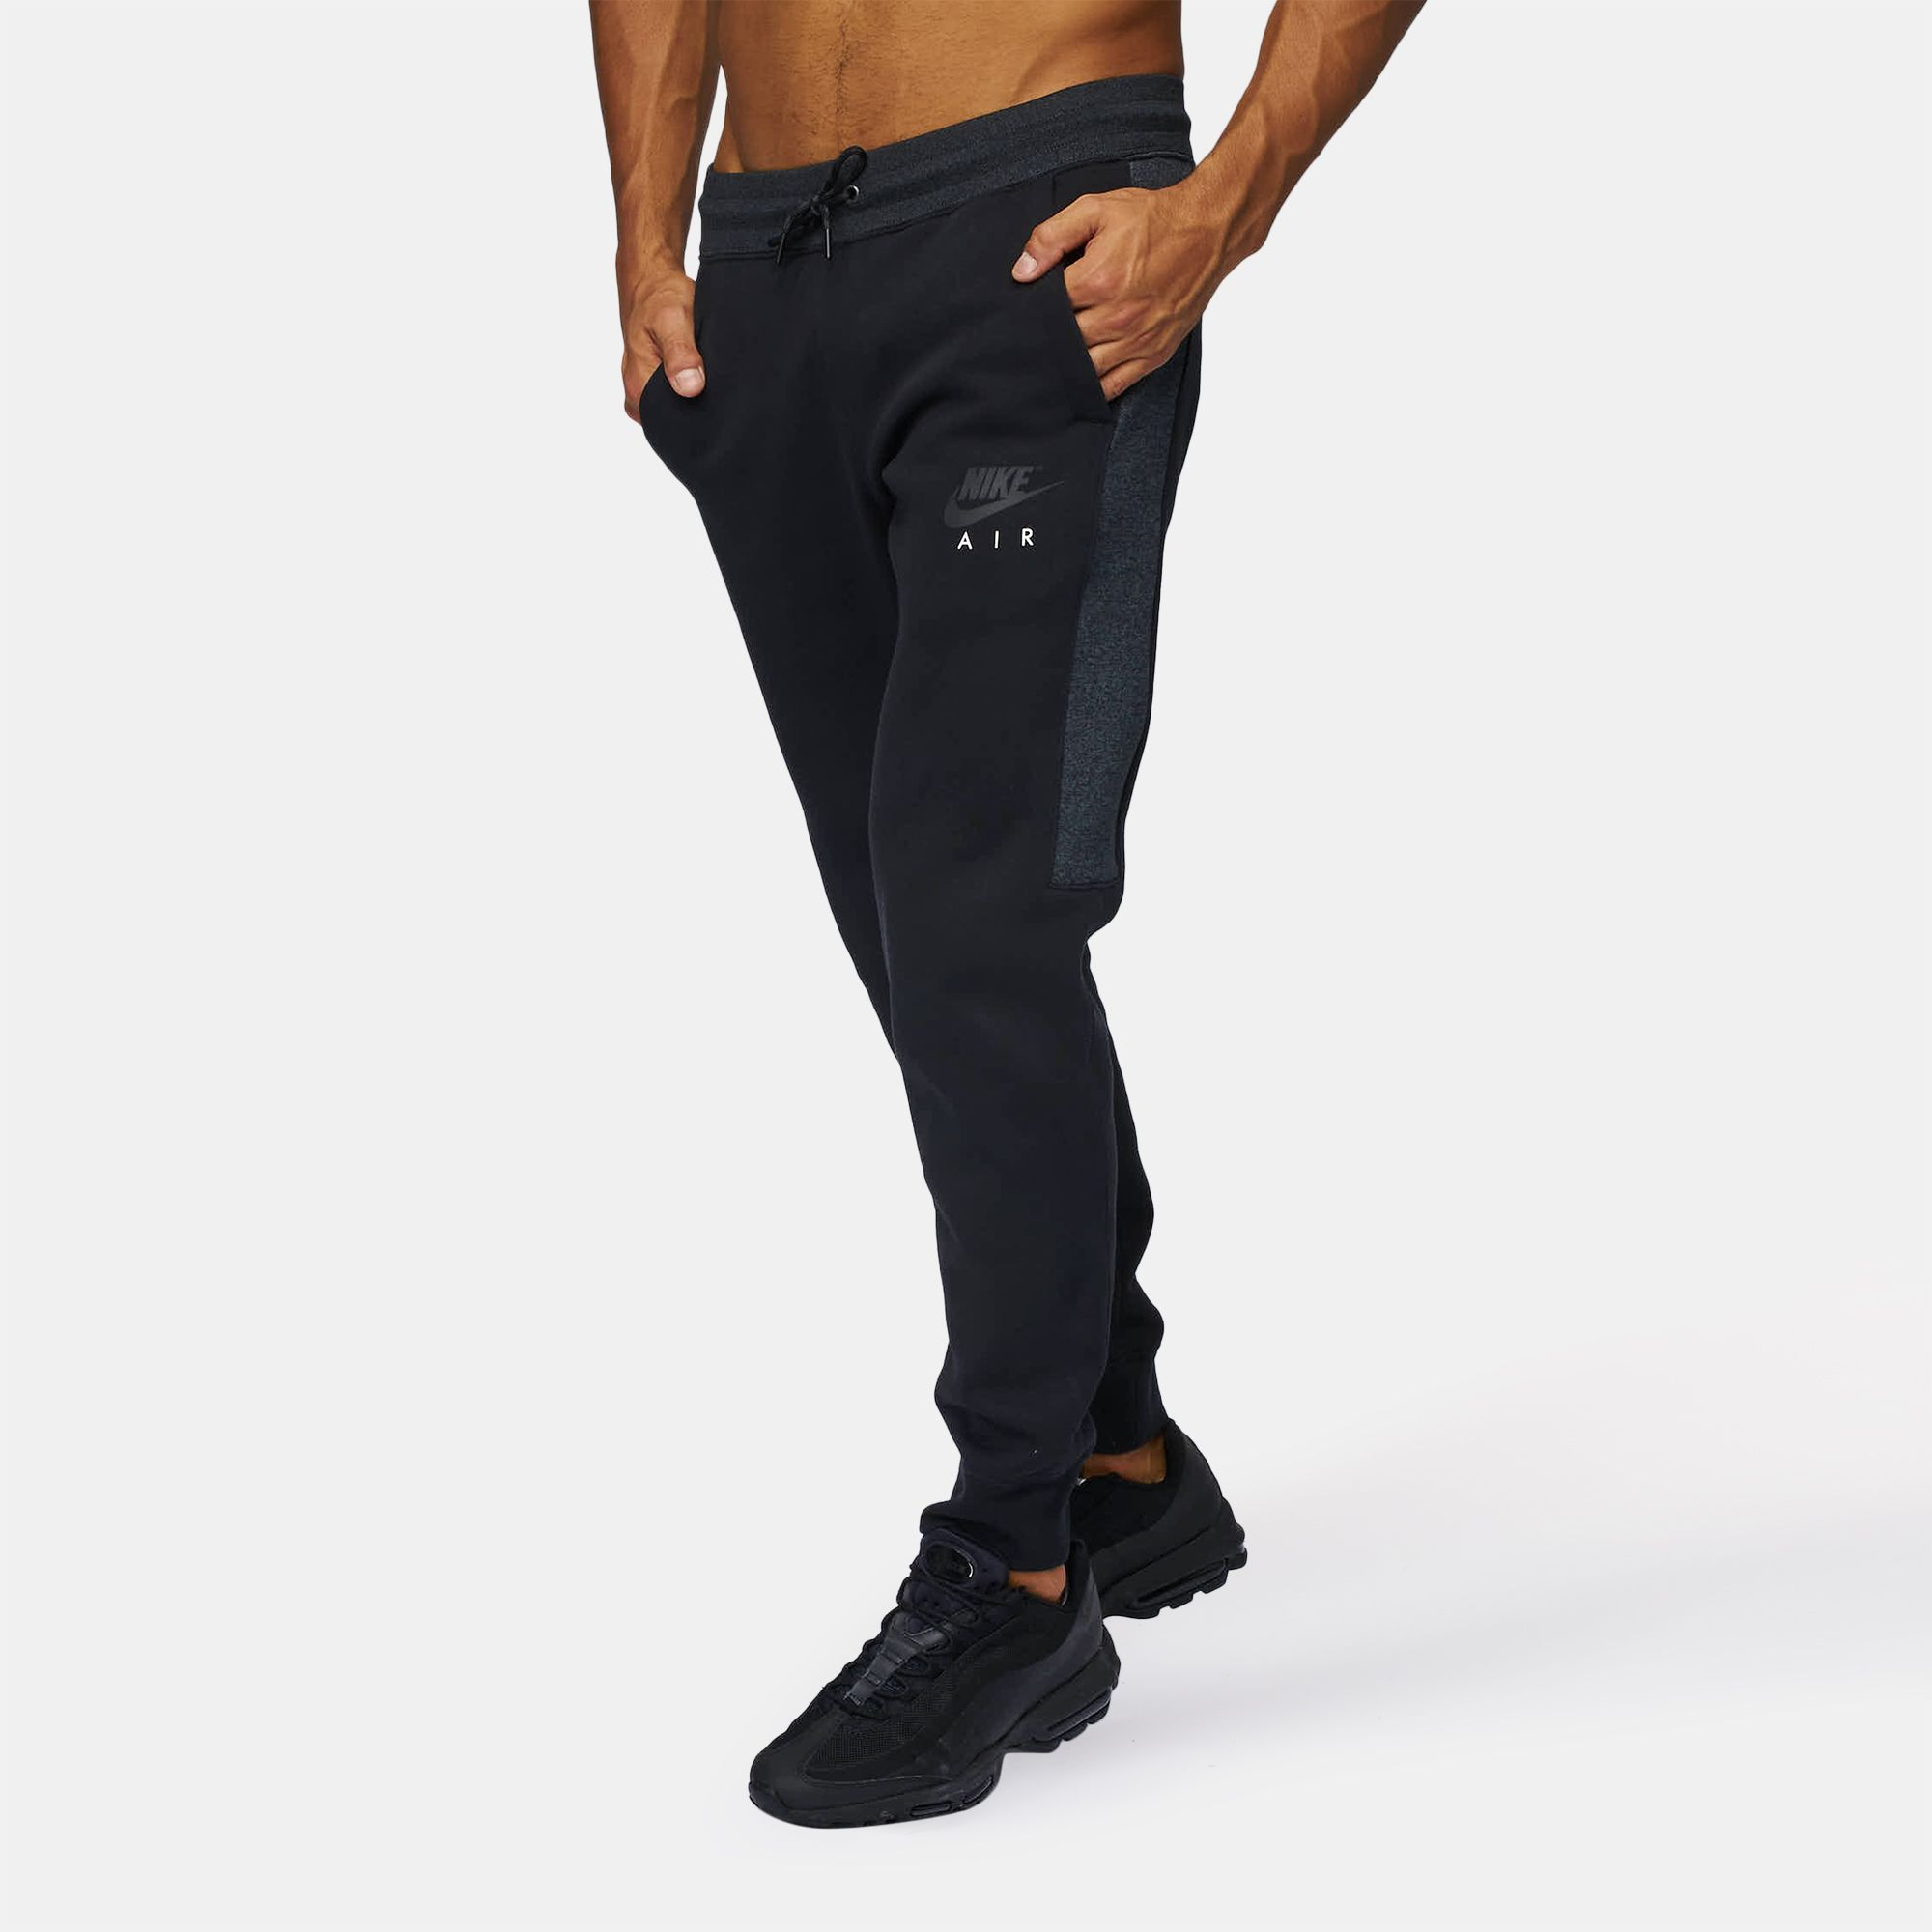 3e87fa9ec Shop Grey Nike Sportswear Air Fleece Jogger Pants for Mens by Nike ...